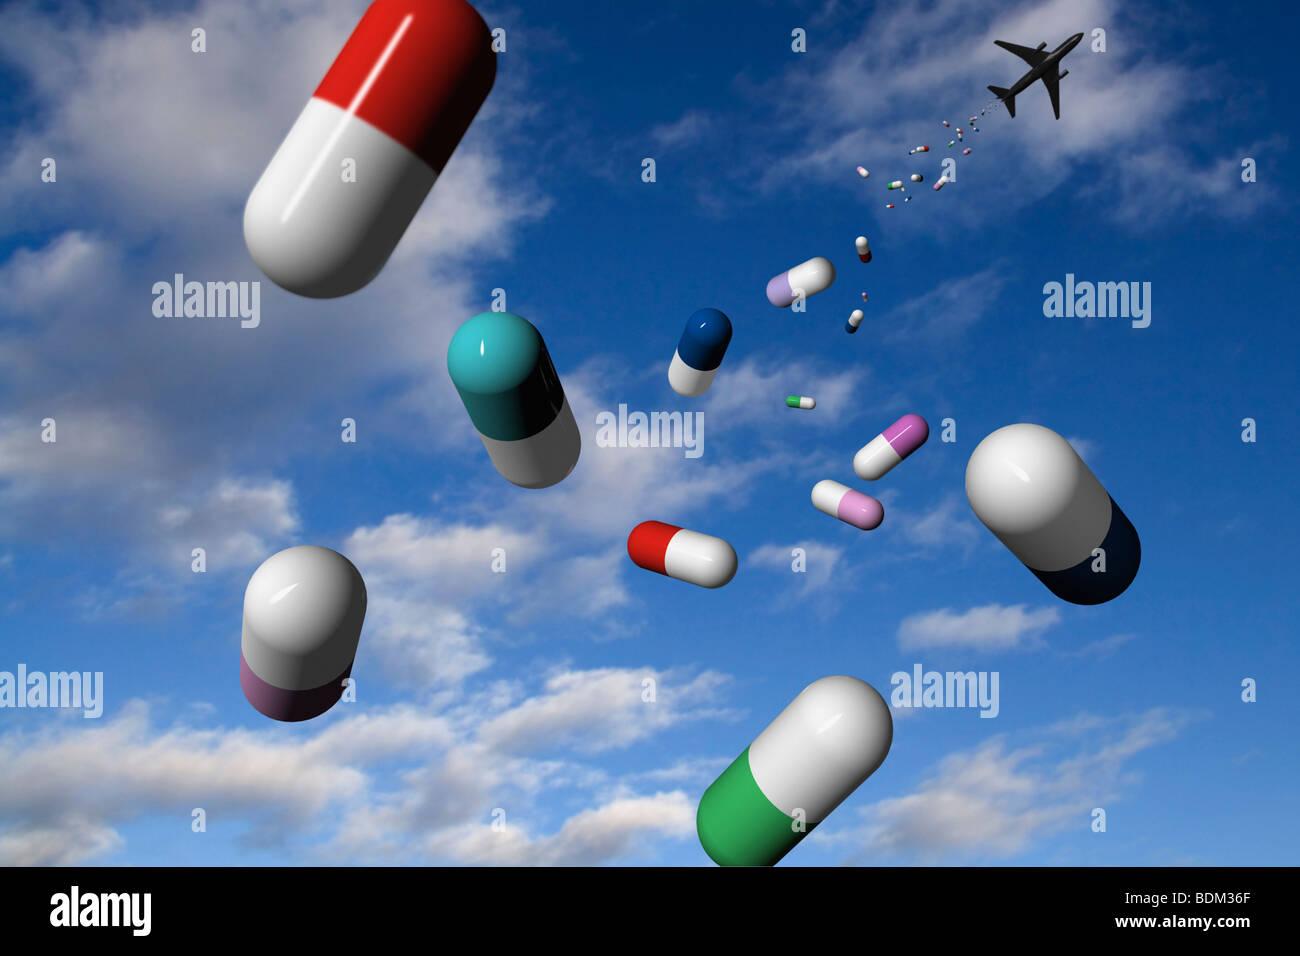 "Ein Flugzeug drops"""" Medizin vom Himmel als Hilfe. CGI-Bild Stockfoto"